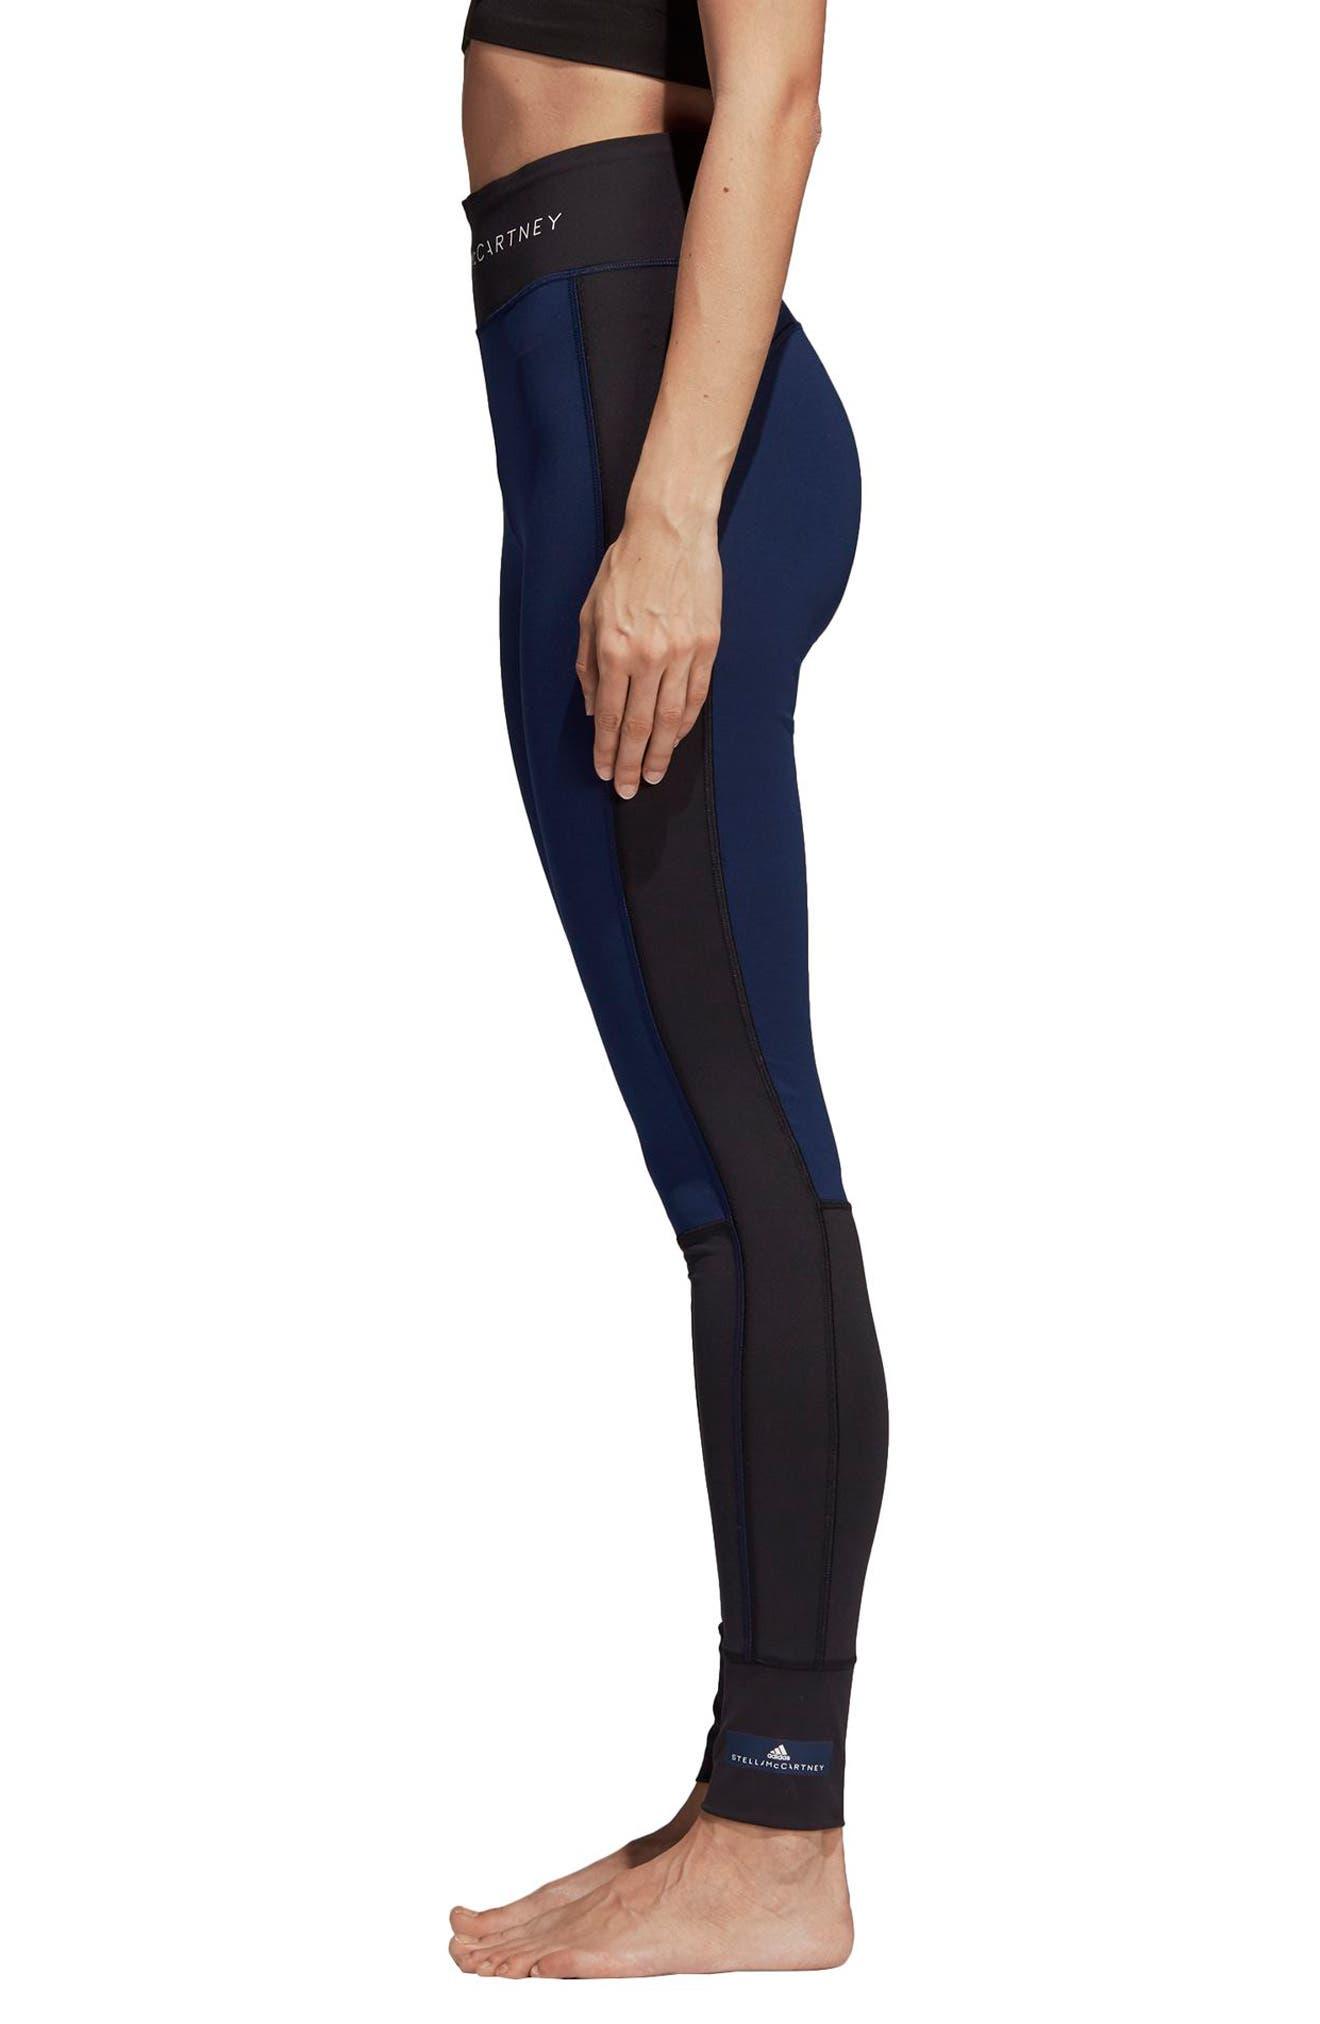 Yoga Comfort Performance Tights,                             Alternate thumbnail 3, color,                             BLACK/ NIND